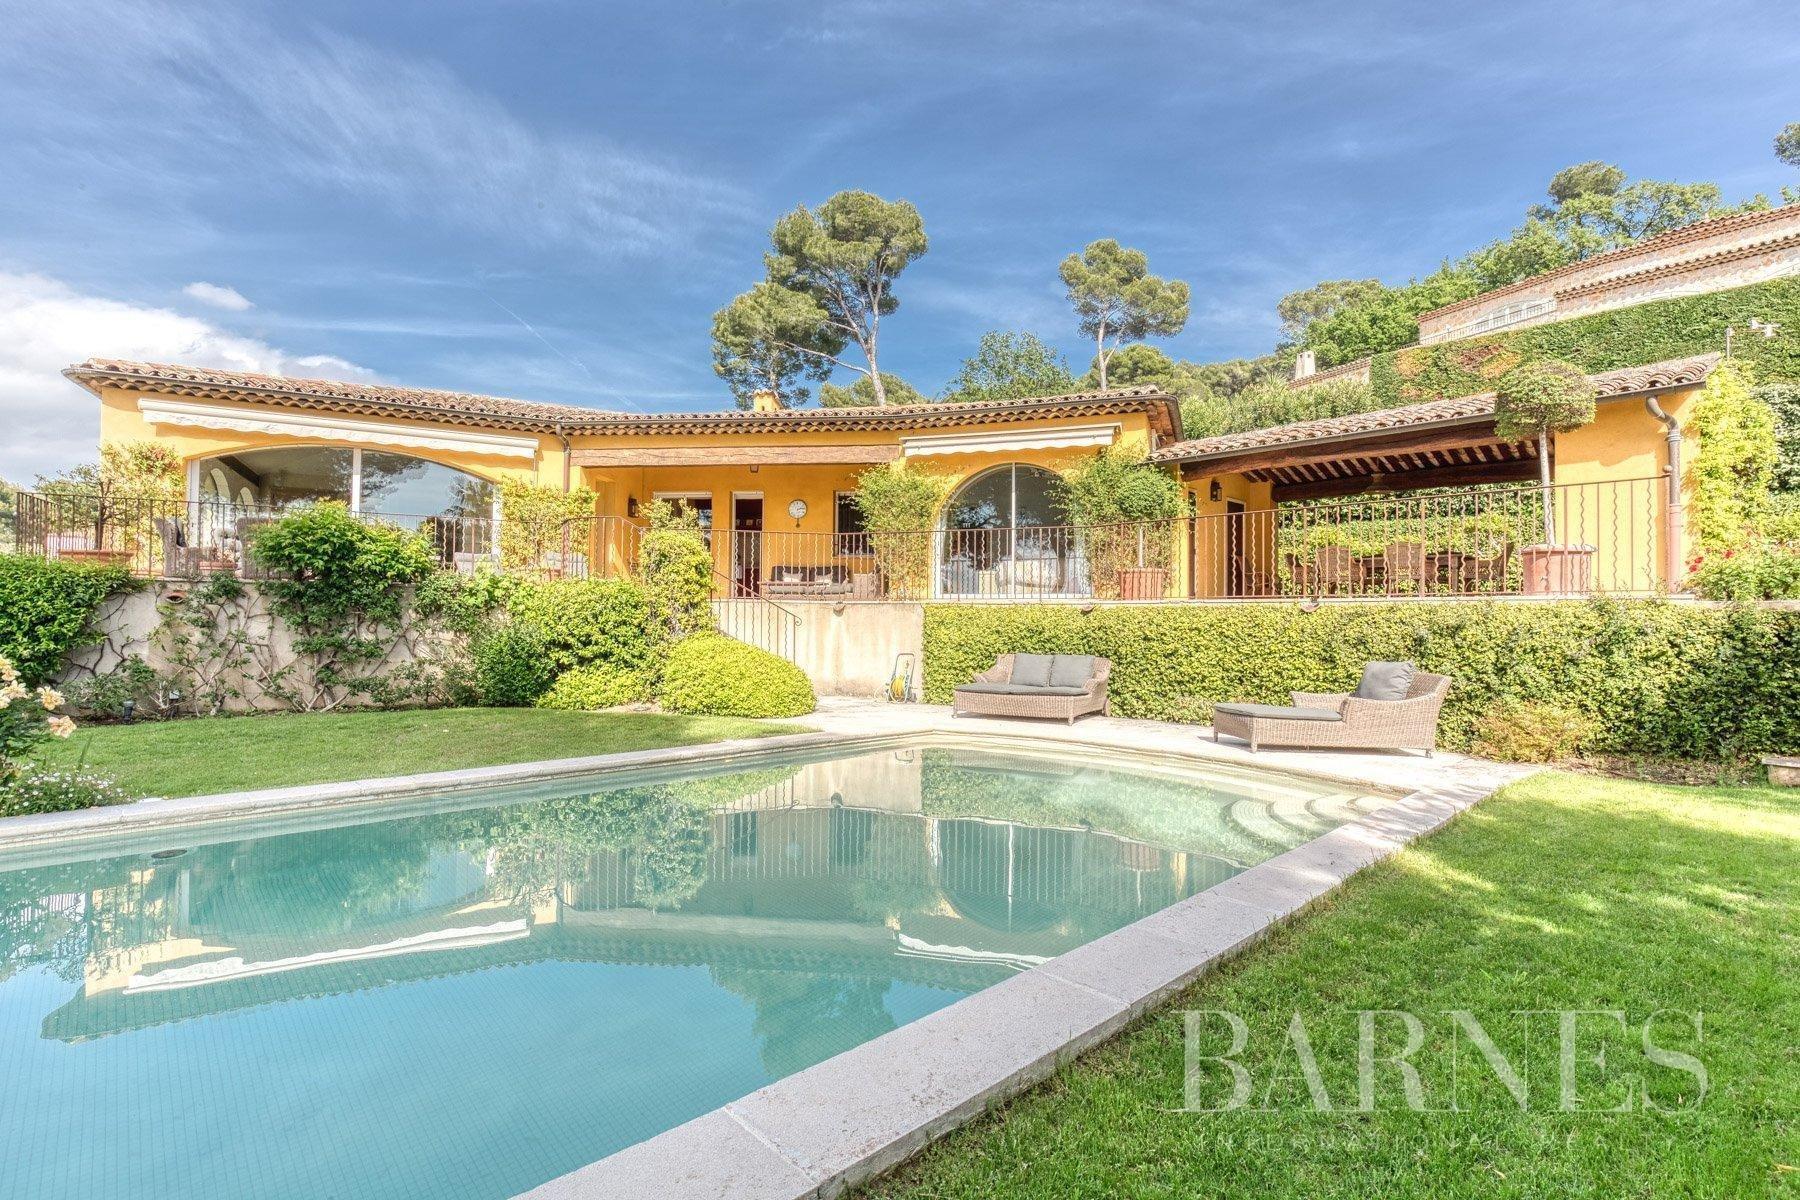 Villa in Mougins, Provence-Alpes-Côte d'Azur, France 1 - 10872828